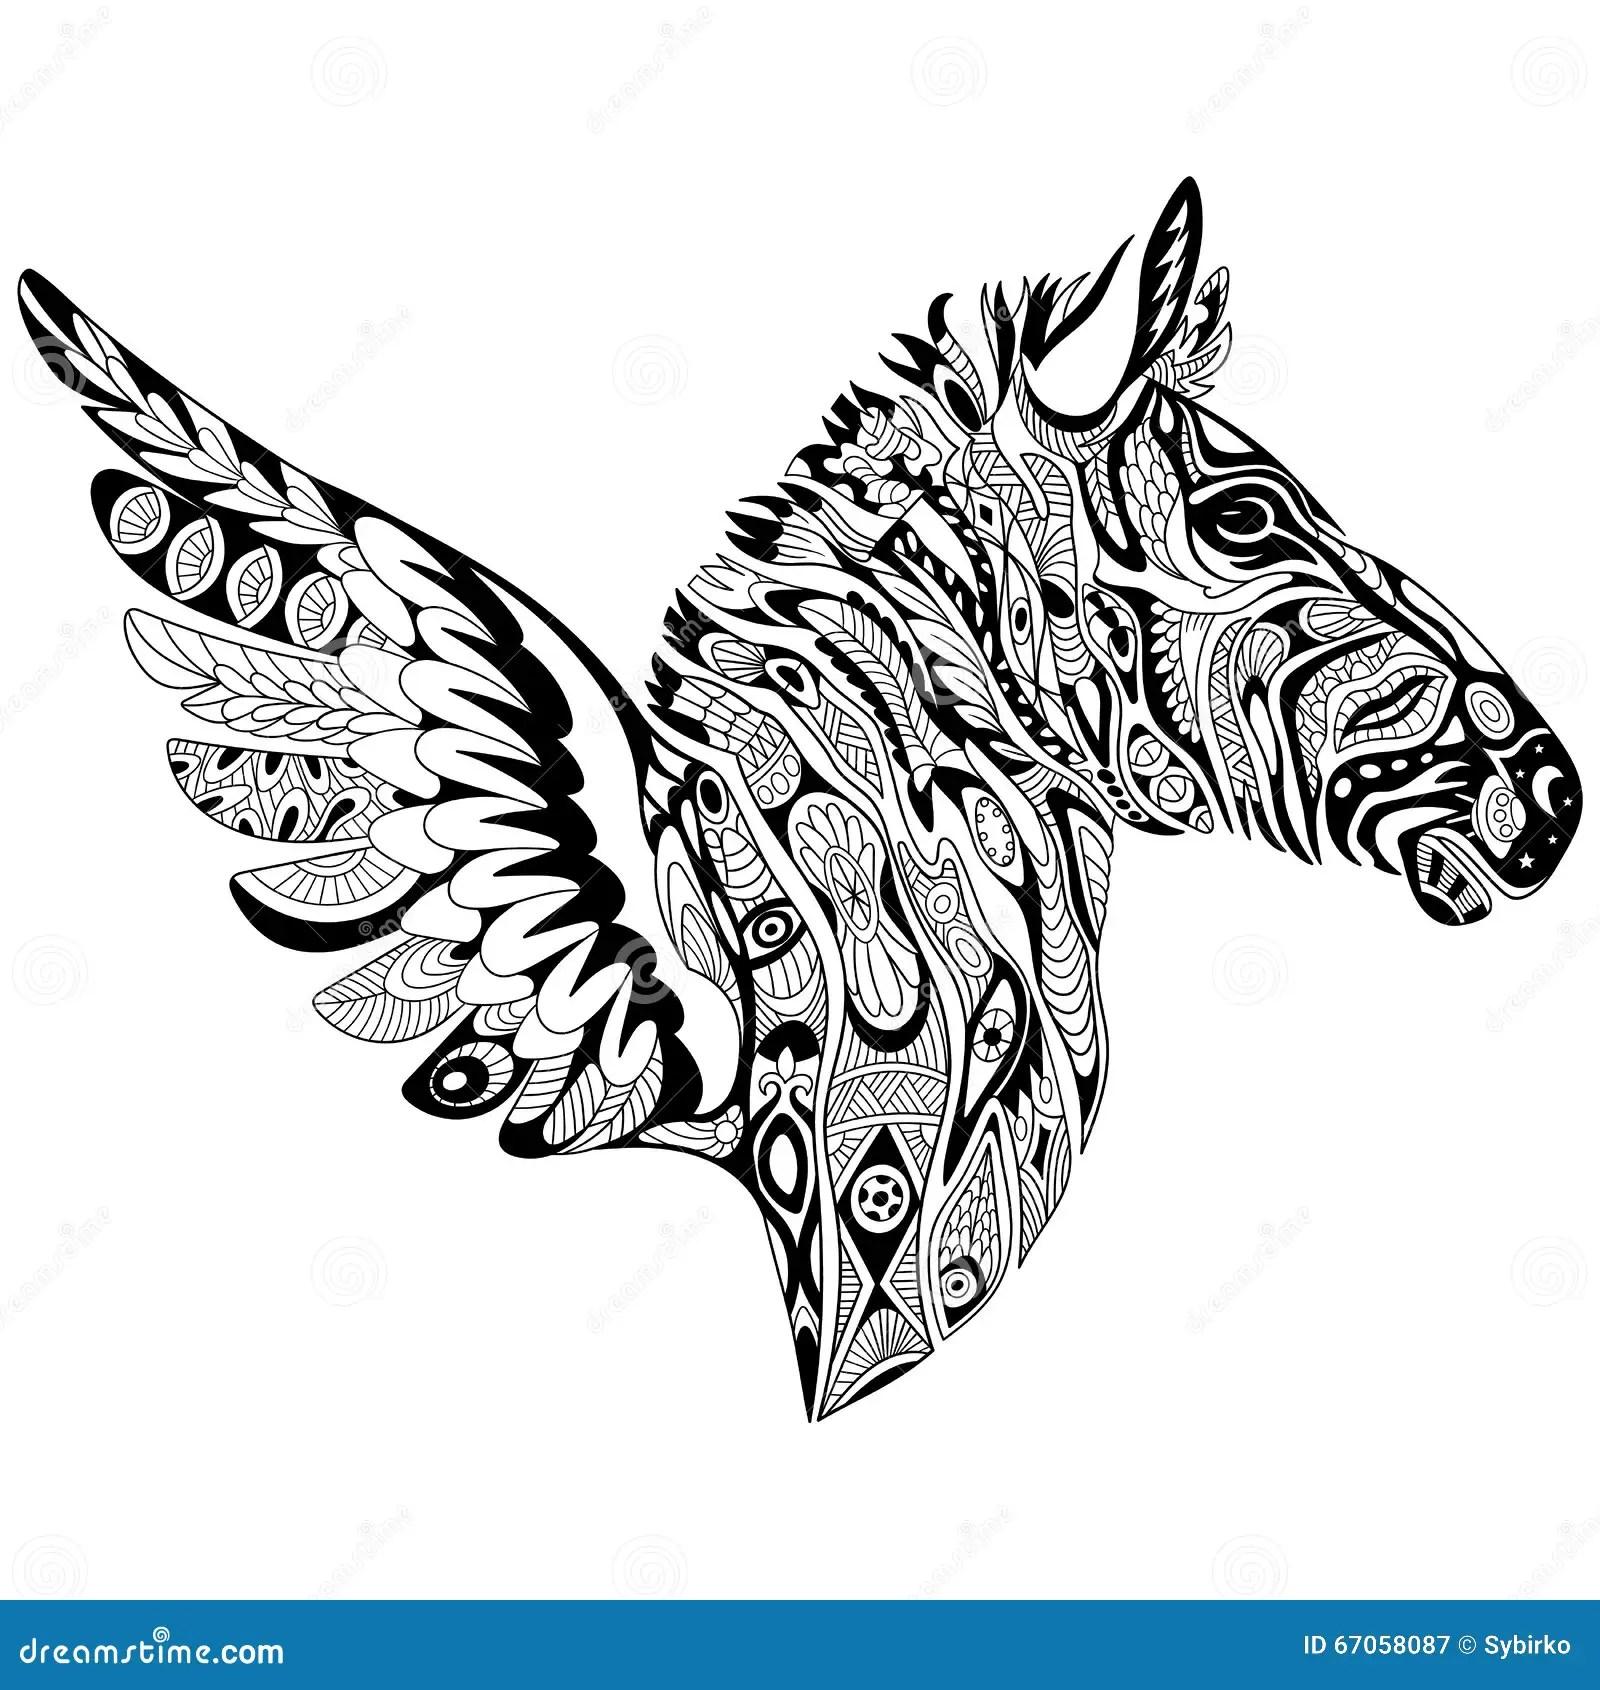 Zentangle Stylized Zebra With Wings Stock Vector